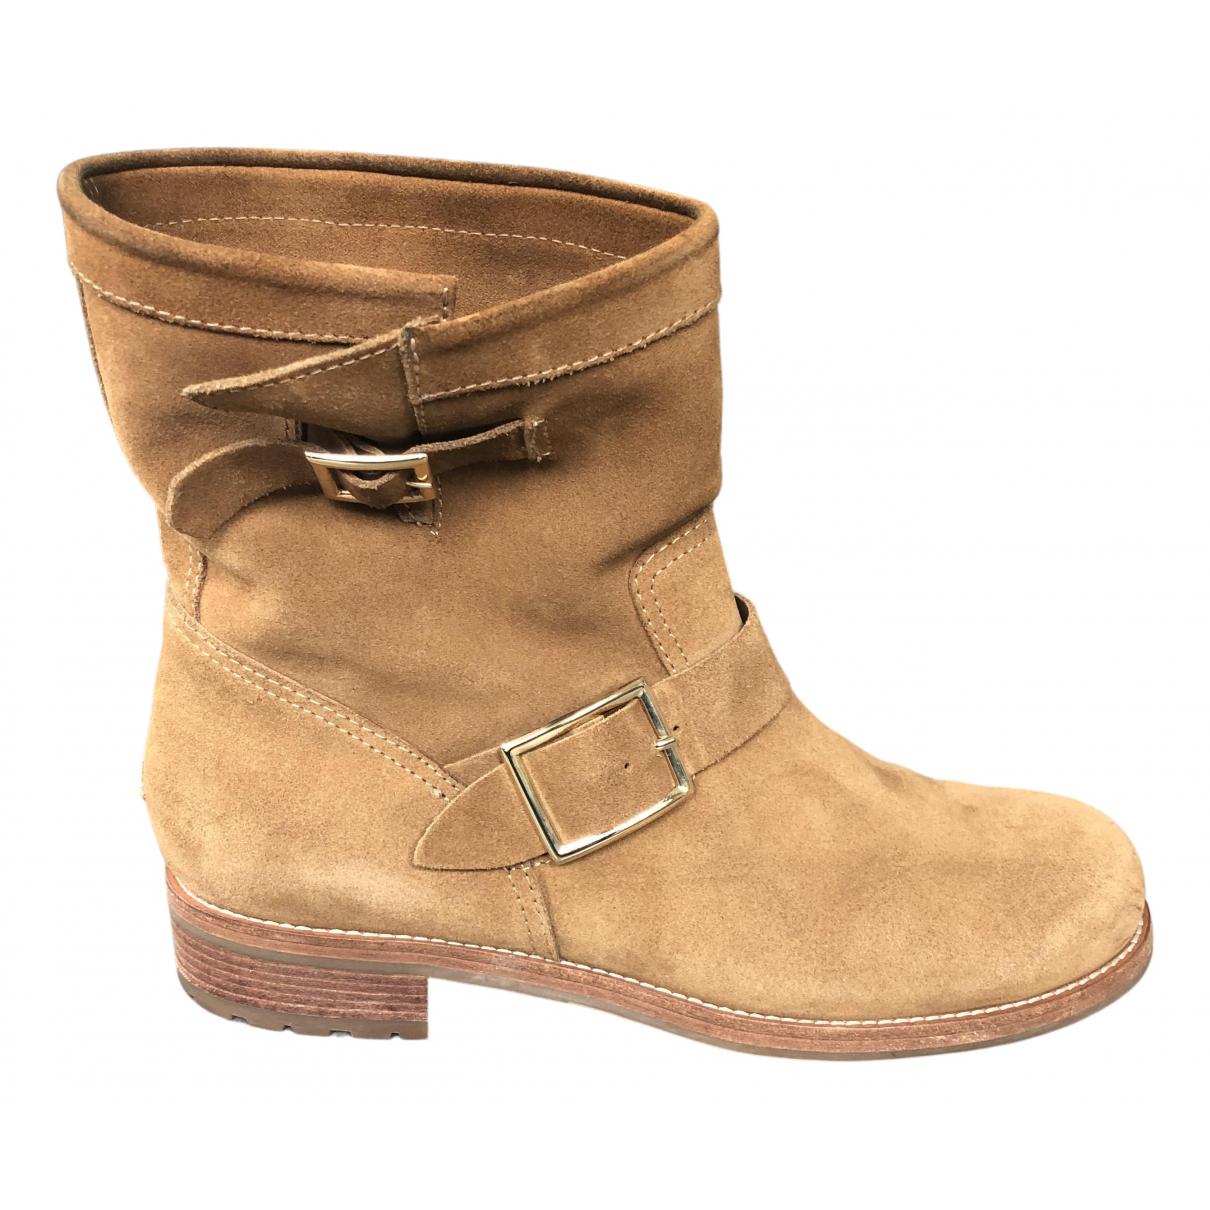 Jimmy Choo - Boots Youth pour femme en suede - camel